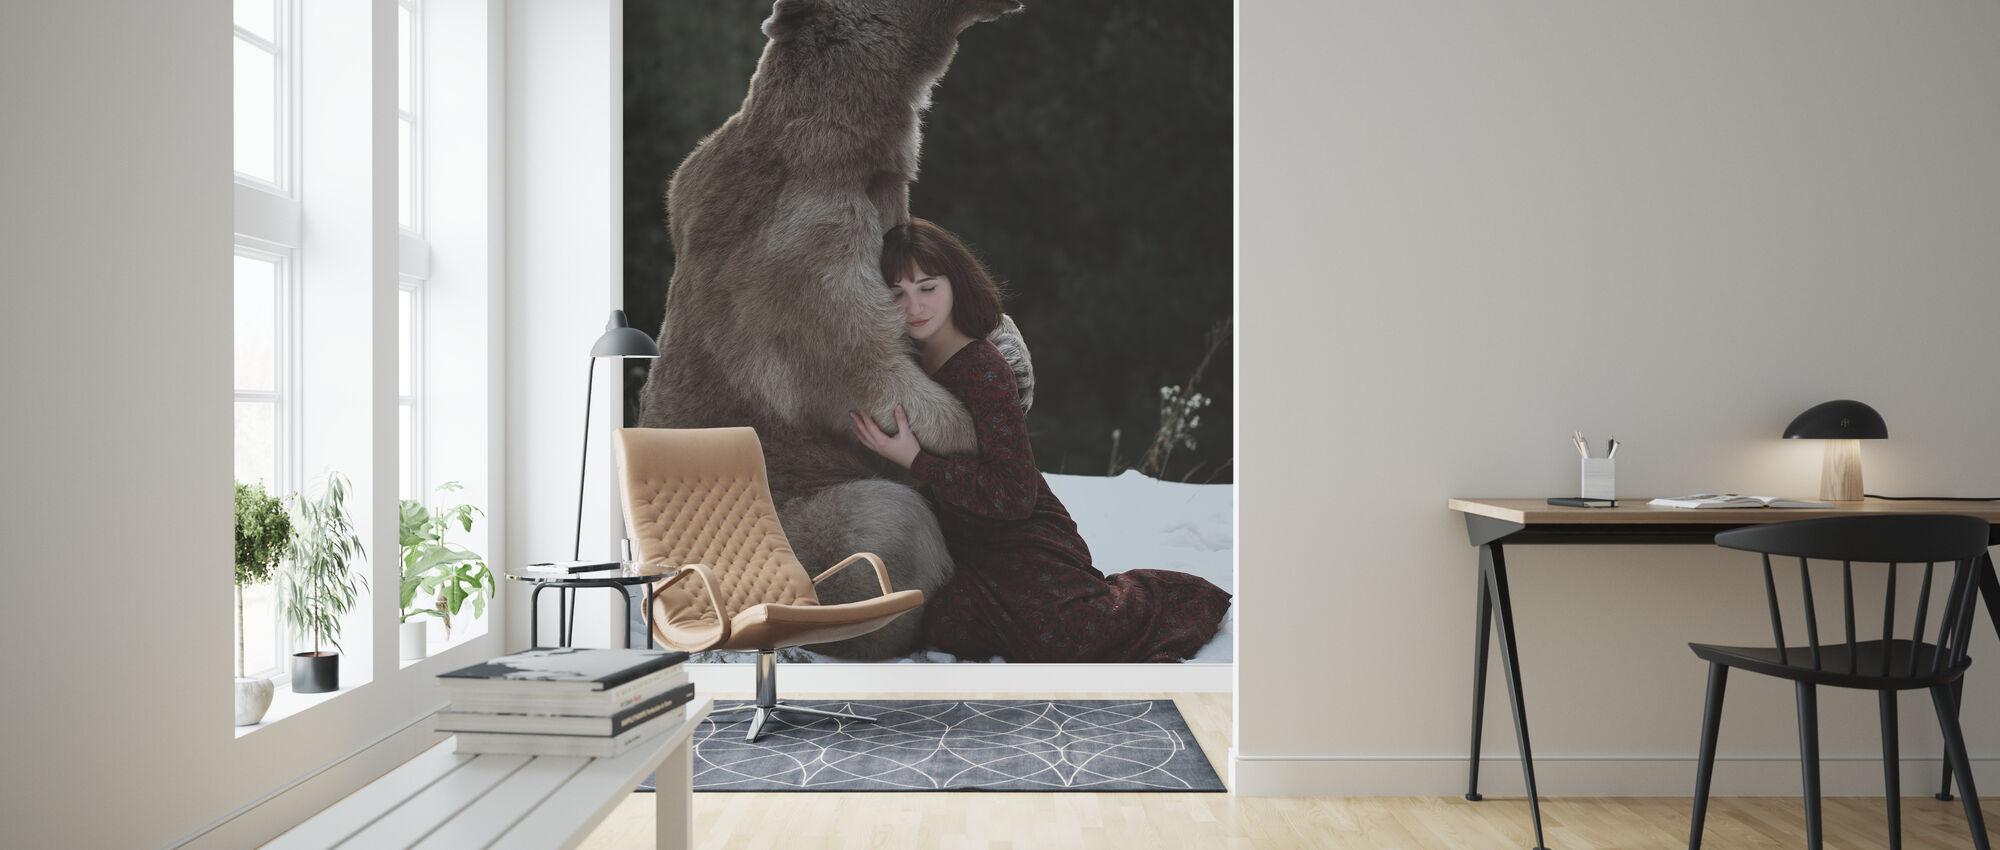 My Big Friend - Wallpaper - Living Room